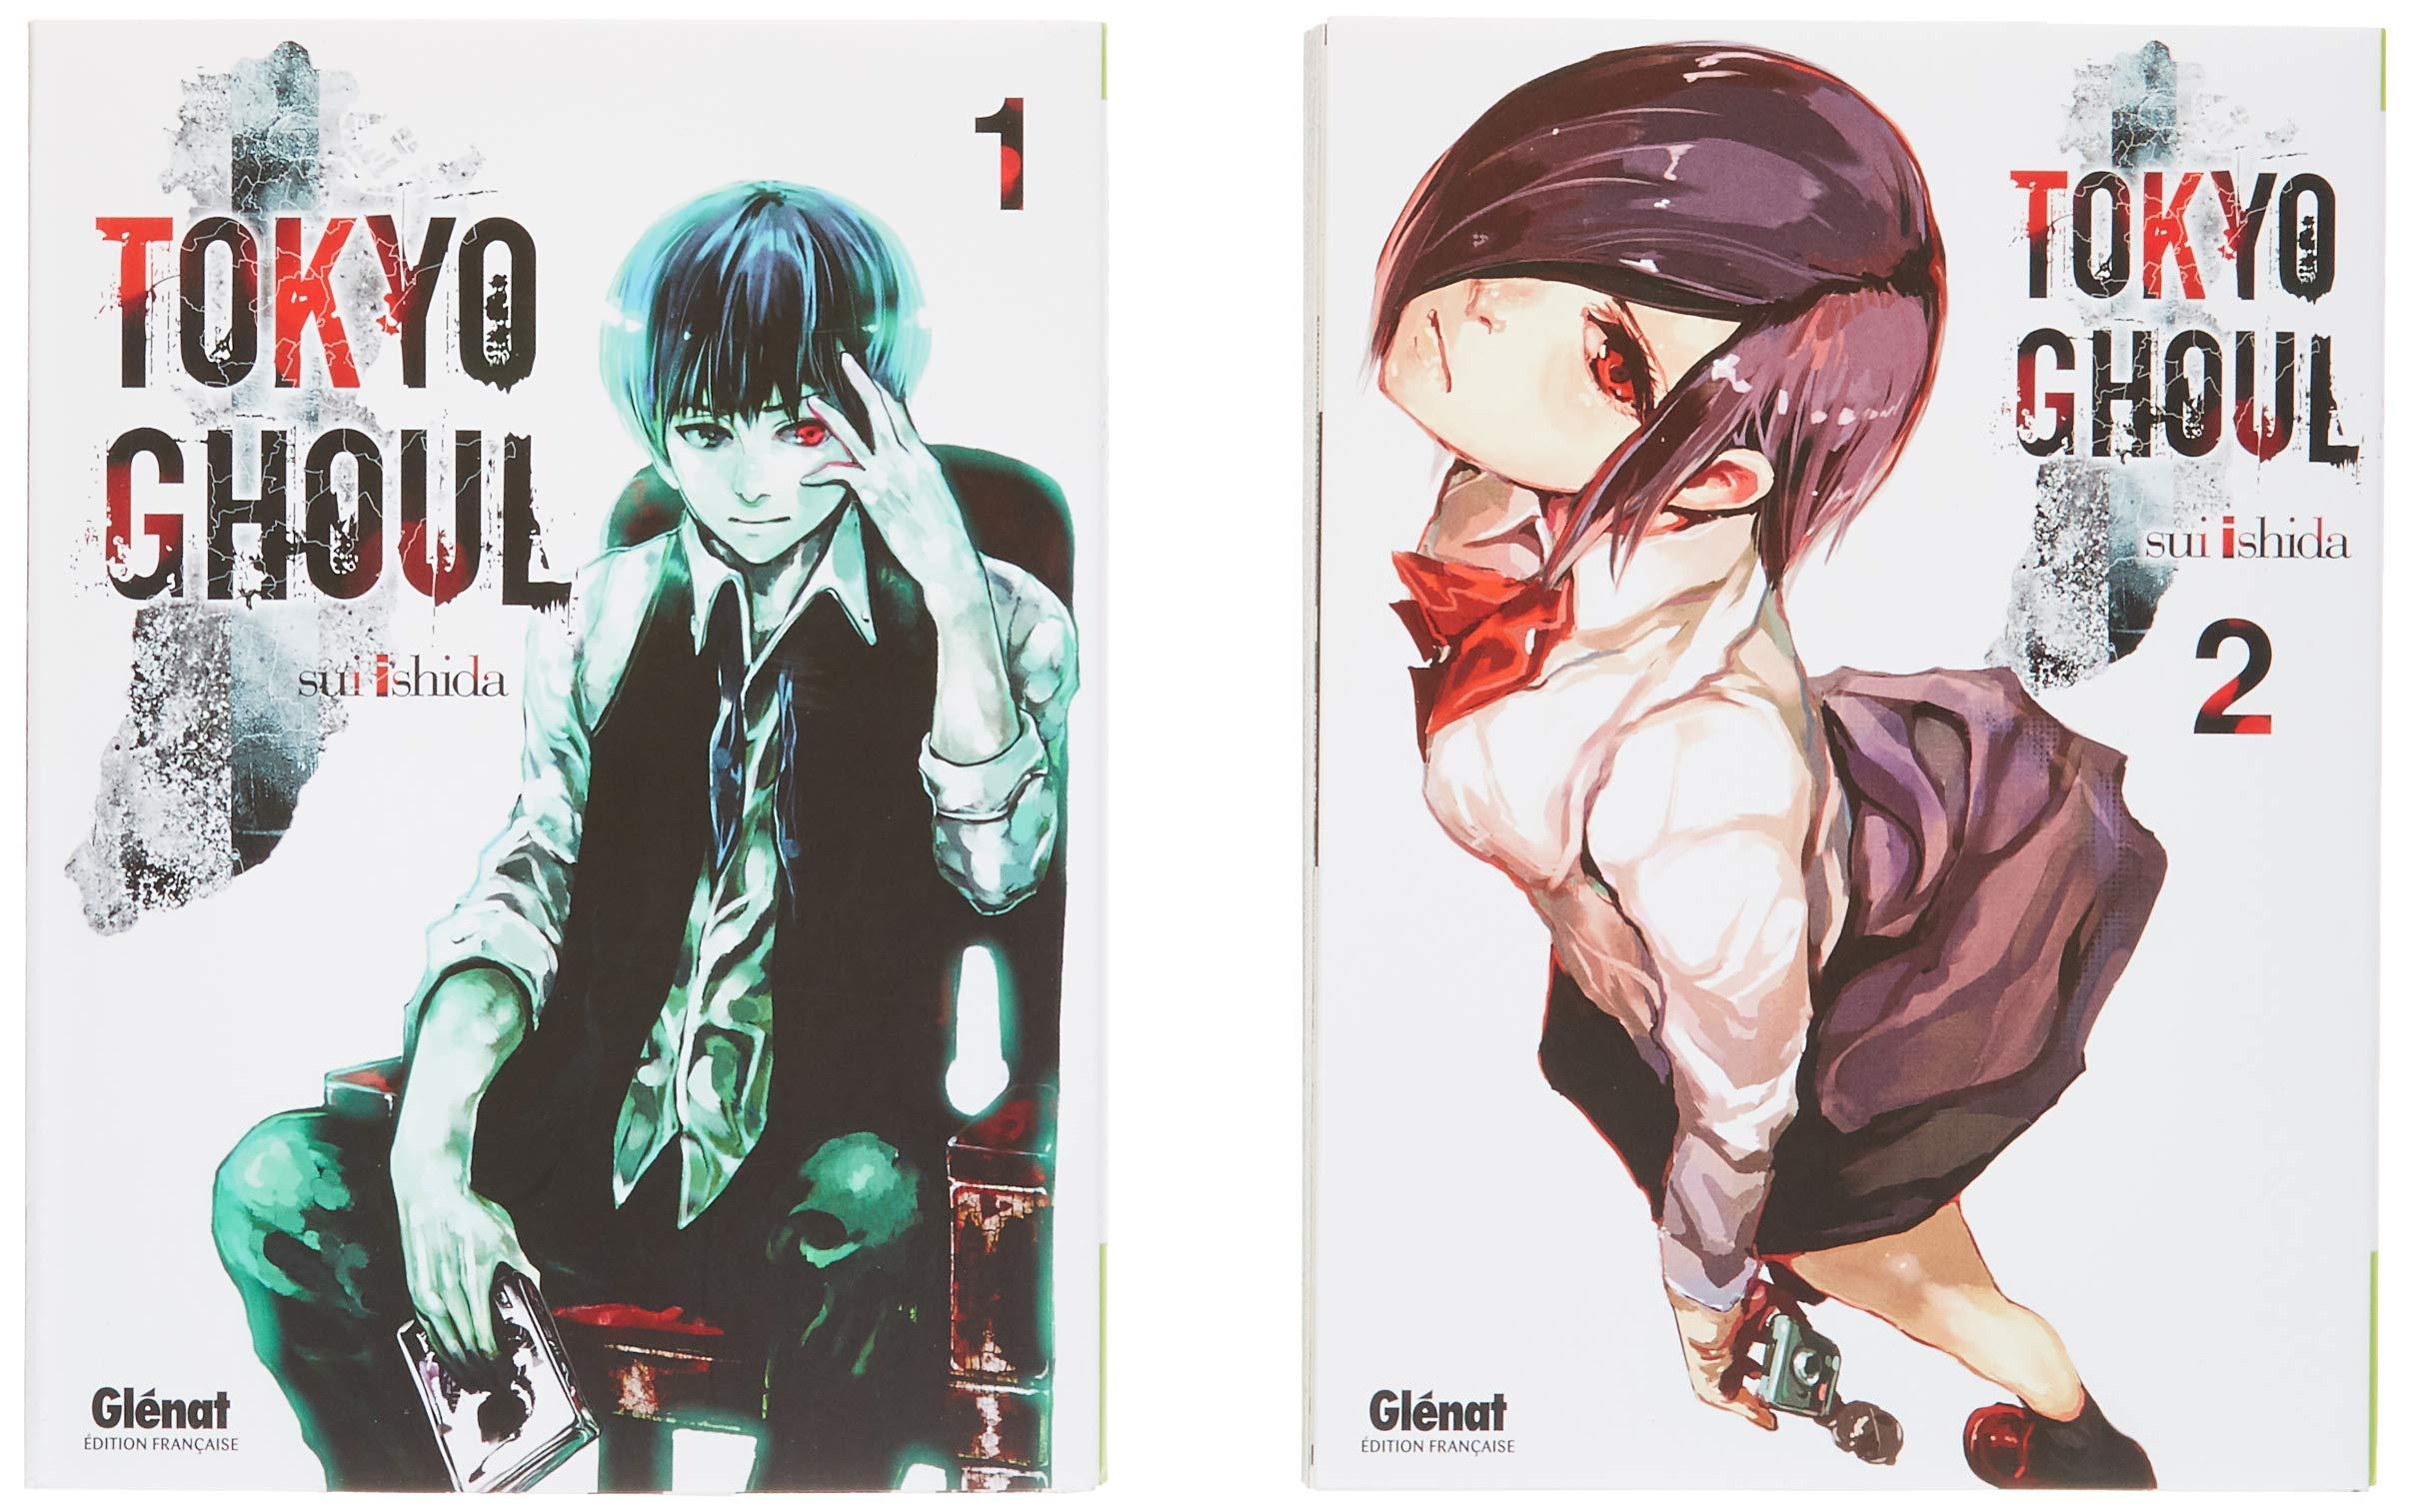 GLENAT TOKYO GHOUL PACK T1 T2 2019 (GLEN.MANGA SHON): Amazon.es: Ishida, Sui: Libros en idiomas extranjeros